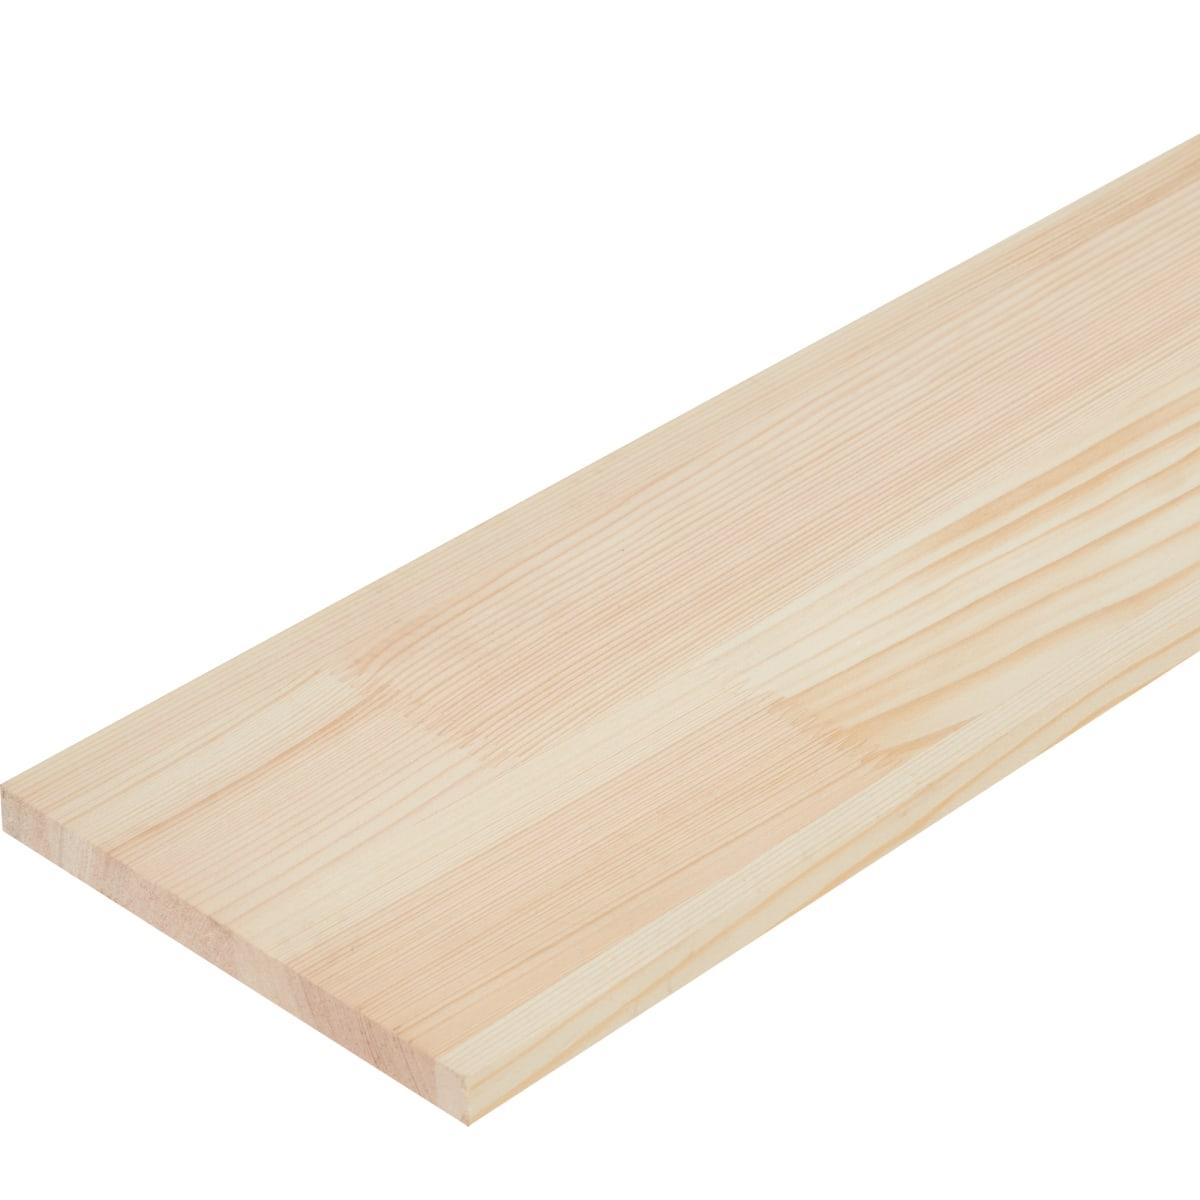 Панель деревянная экстра 11х120х3000 мм